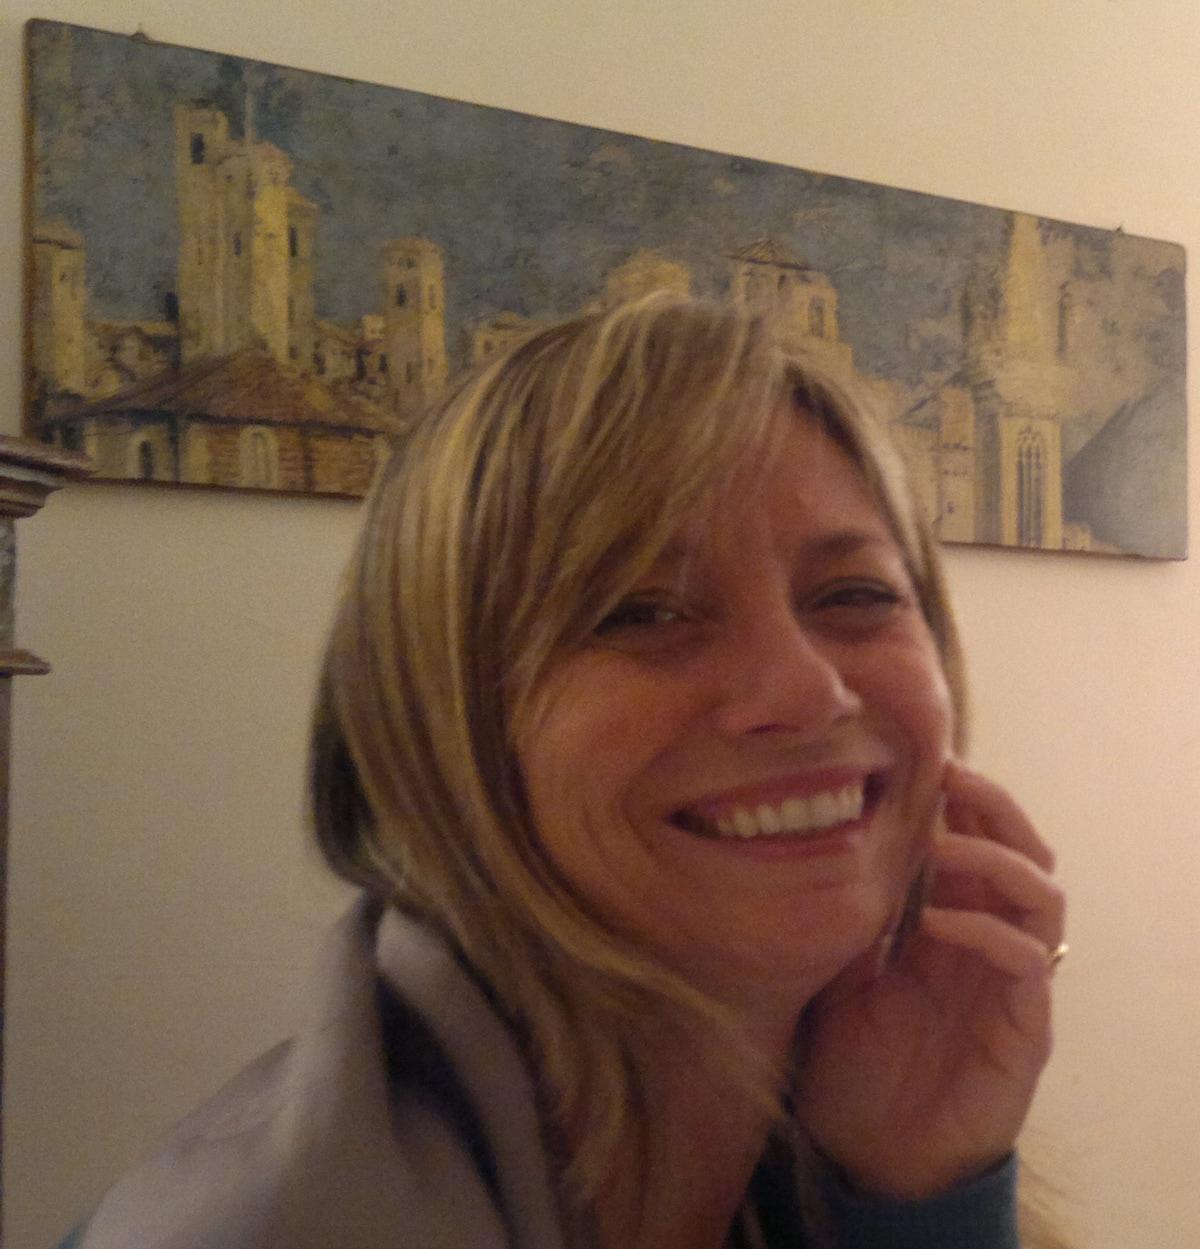 Hi, my name is MariaCristina and I live with my hu